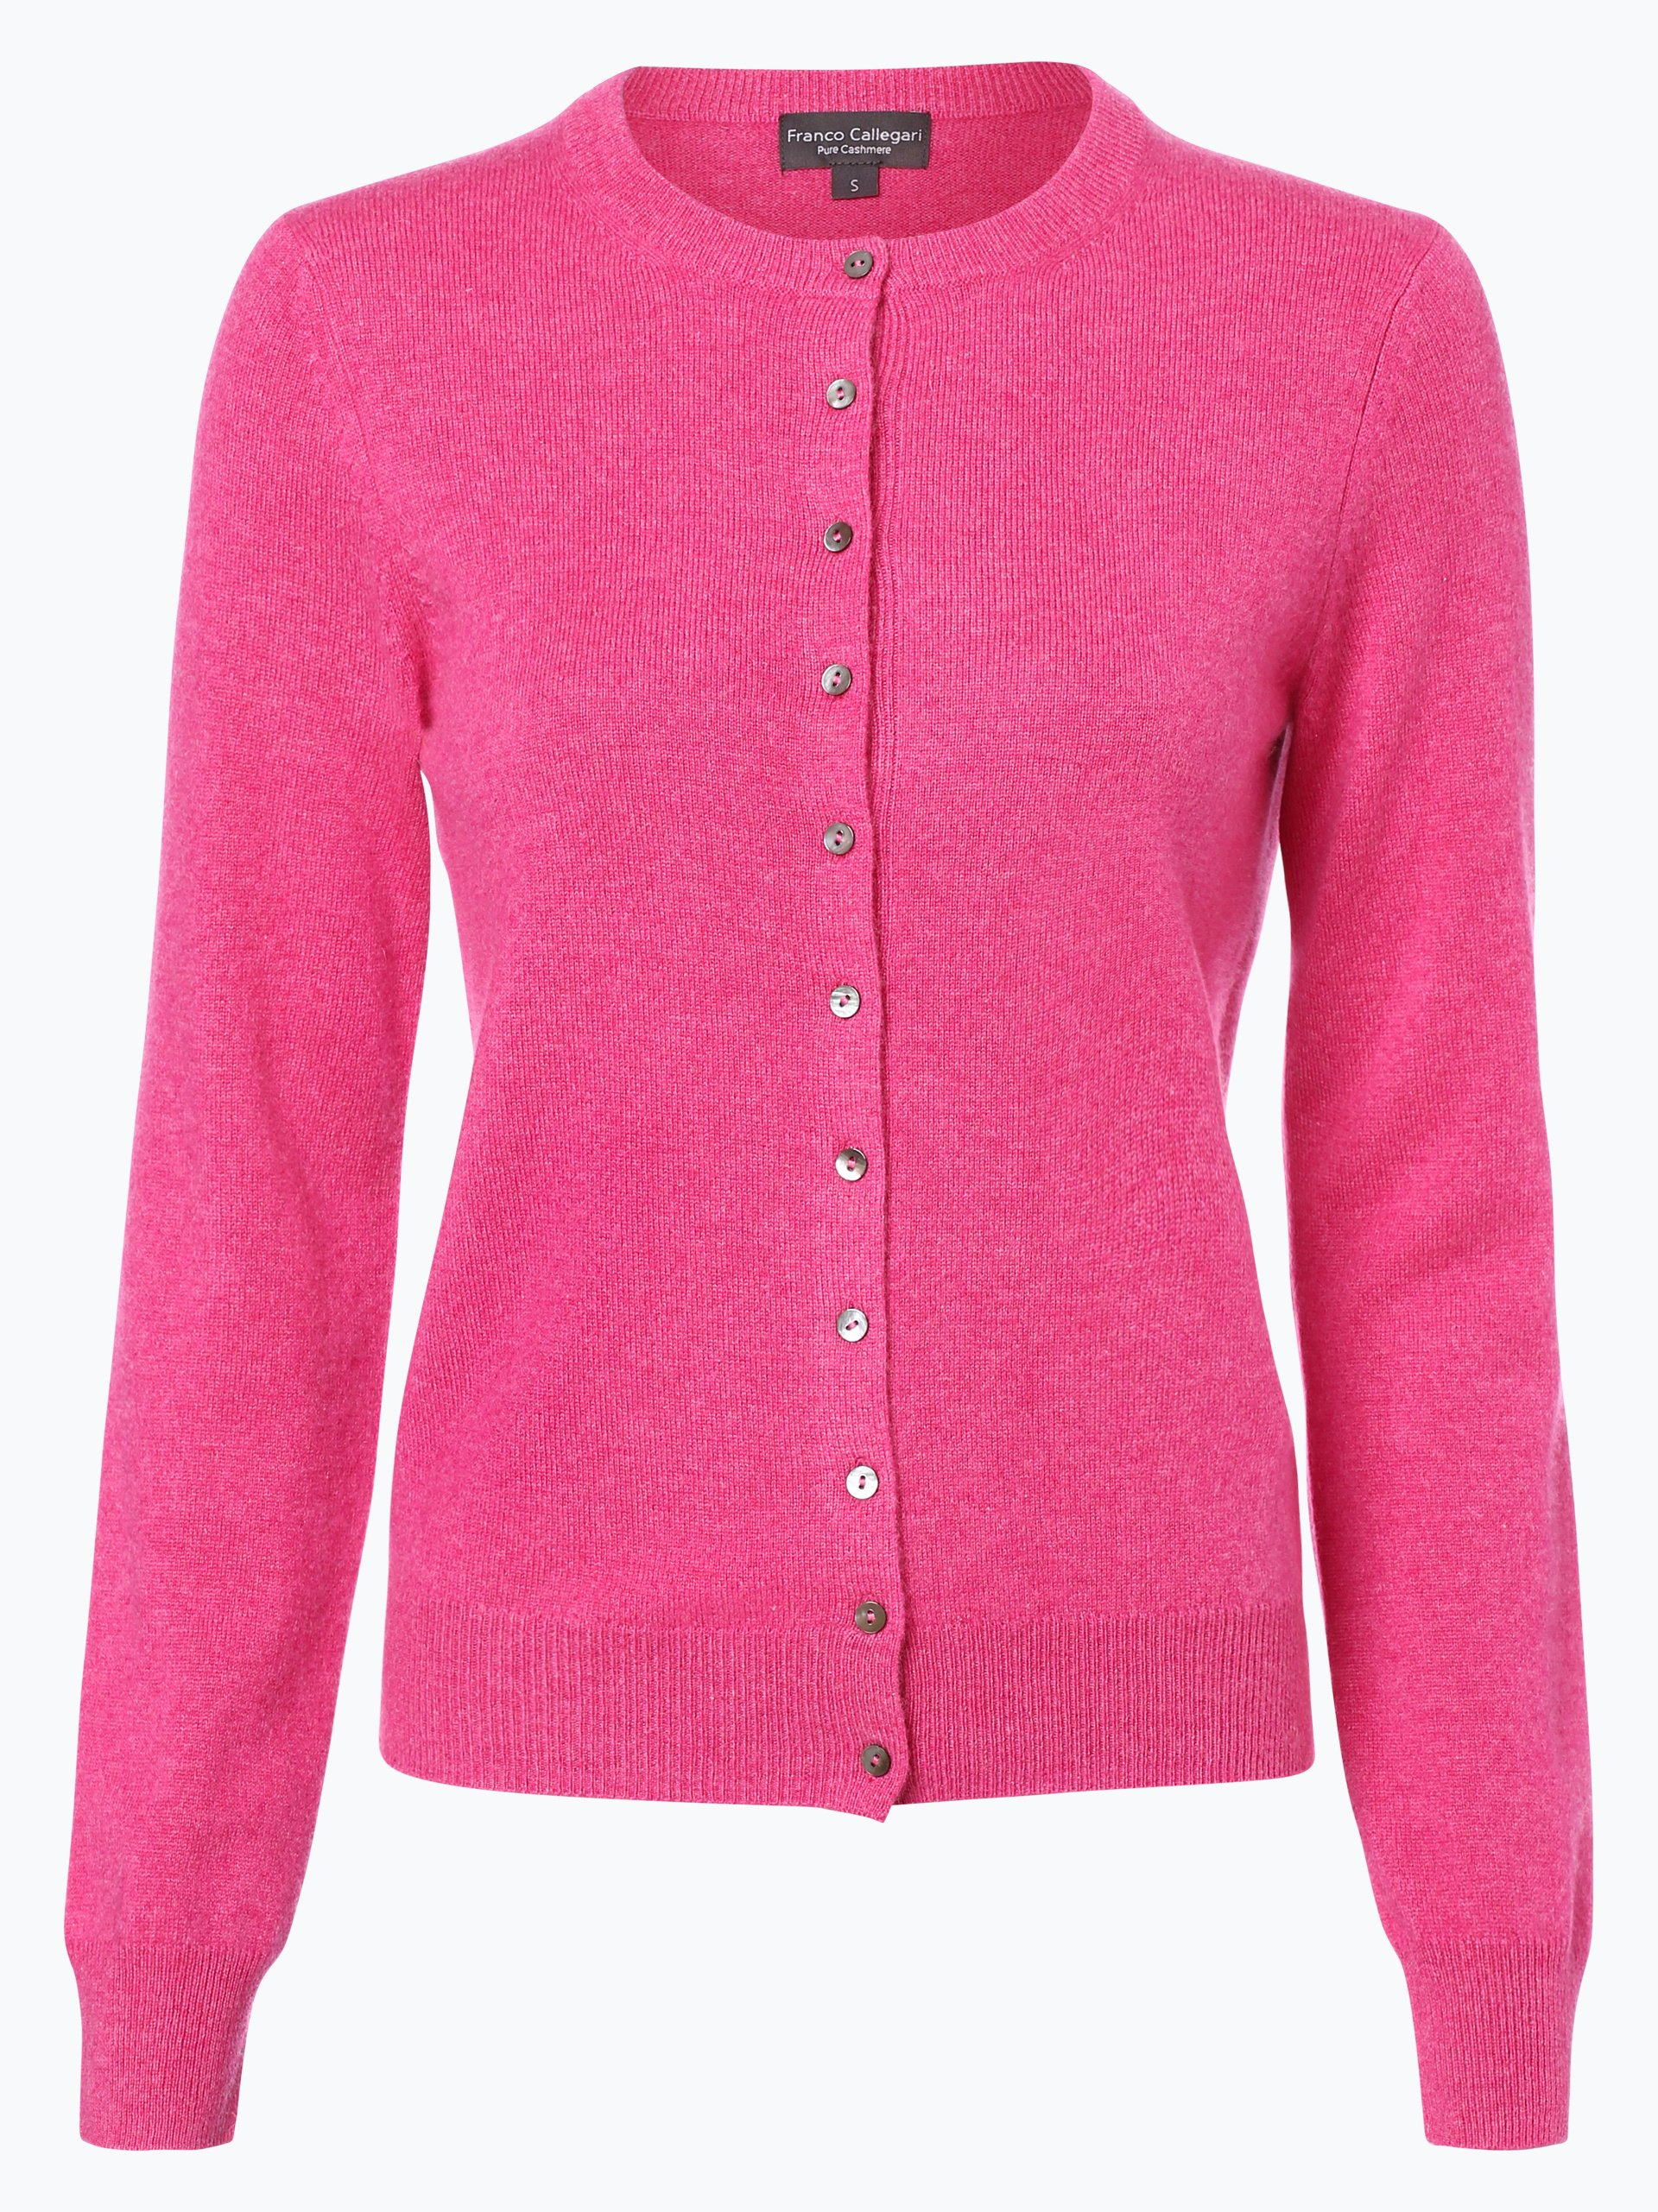 franco callegari damen pure cashmere strickjacke pink uni online kaufen peek und cloppenburg de. Black Bedroom Furniture Sets. Home Design Ideas